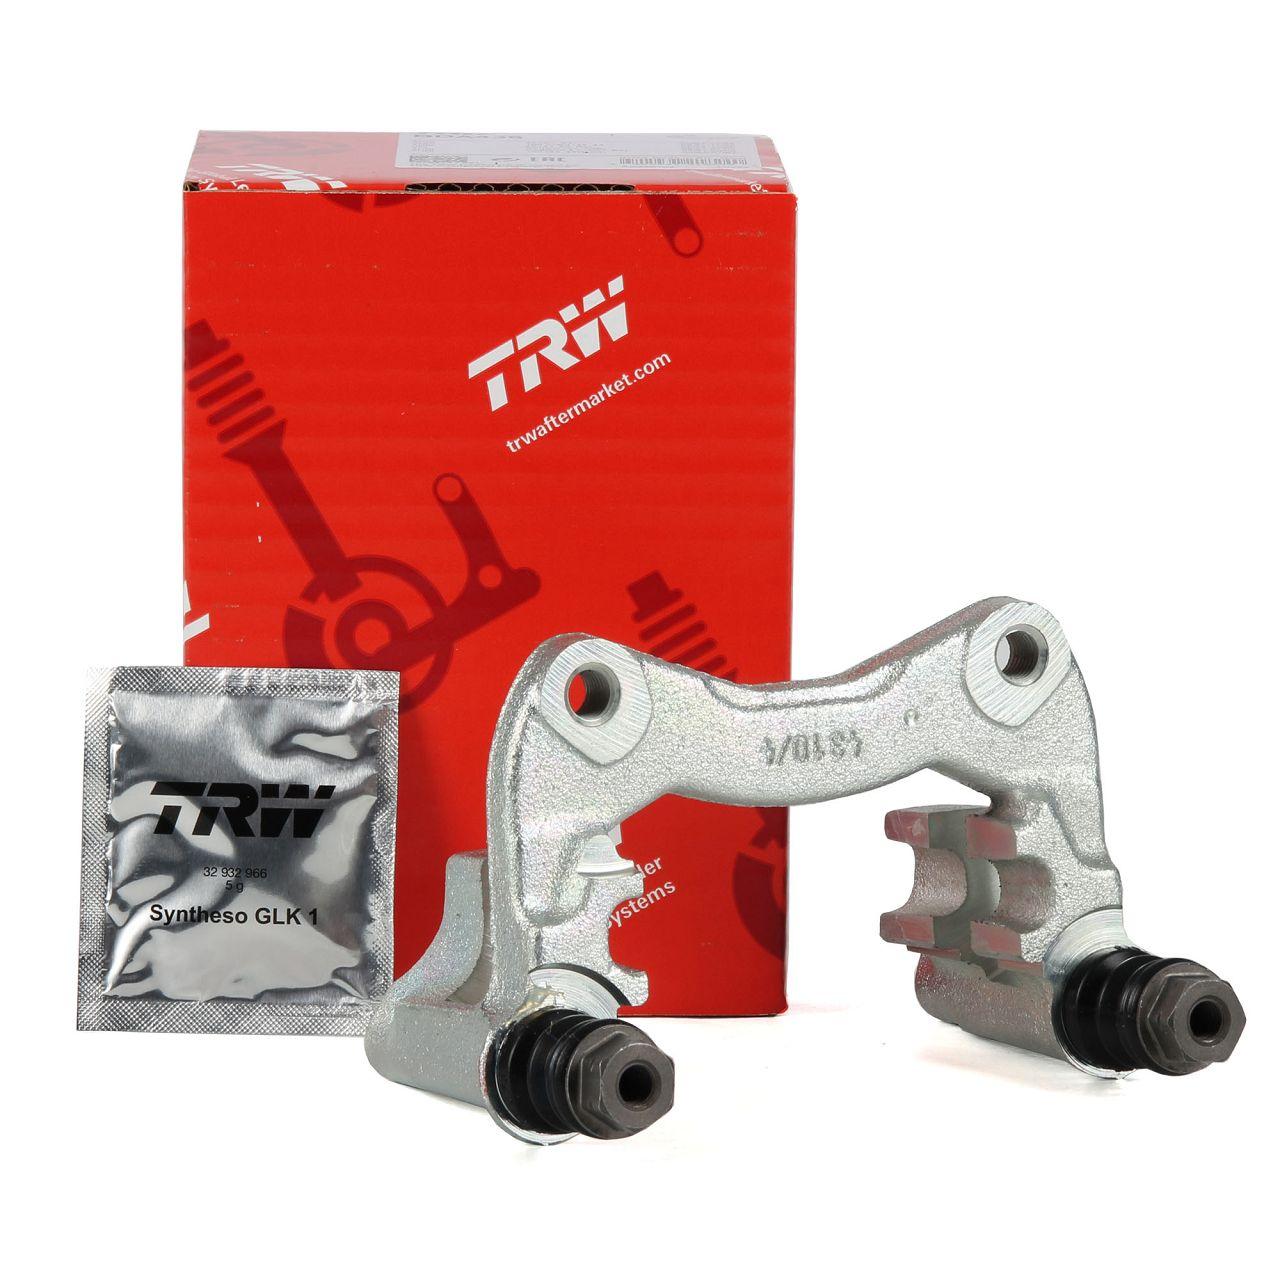 TRW BDA436 Bremssattelhalter für AUDI 100 200 80 A4 A6 VW GOLF 1 2 PASSAT hinten